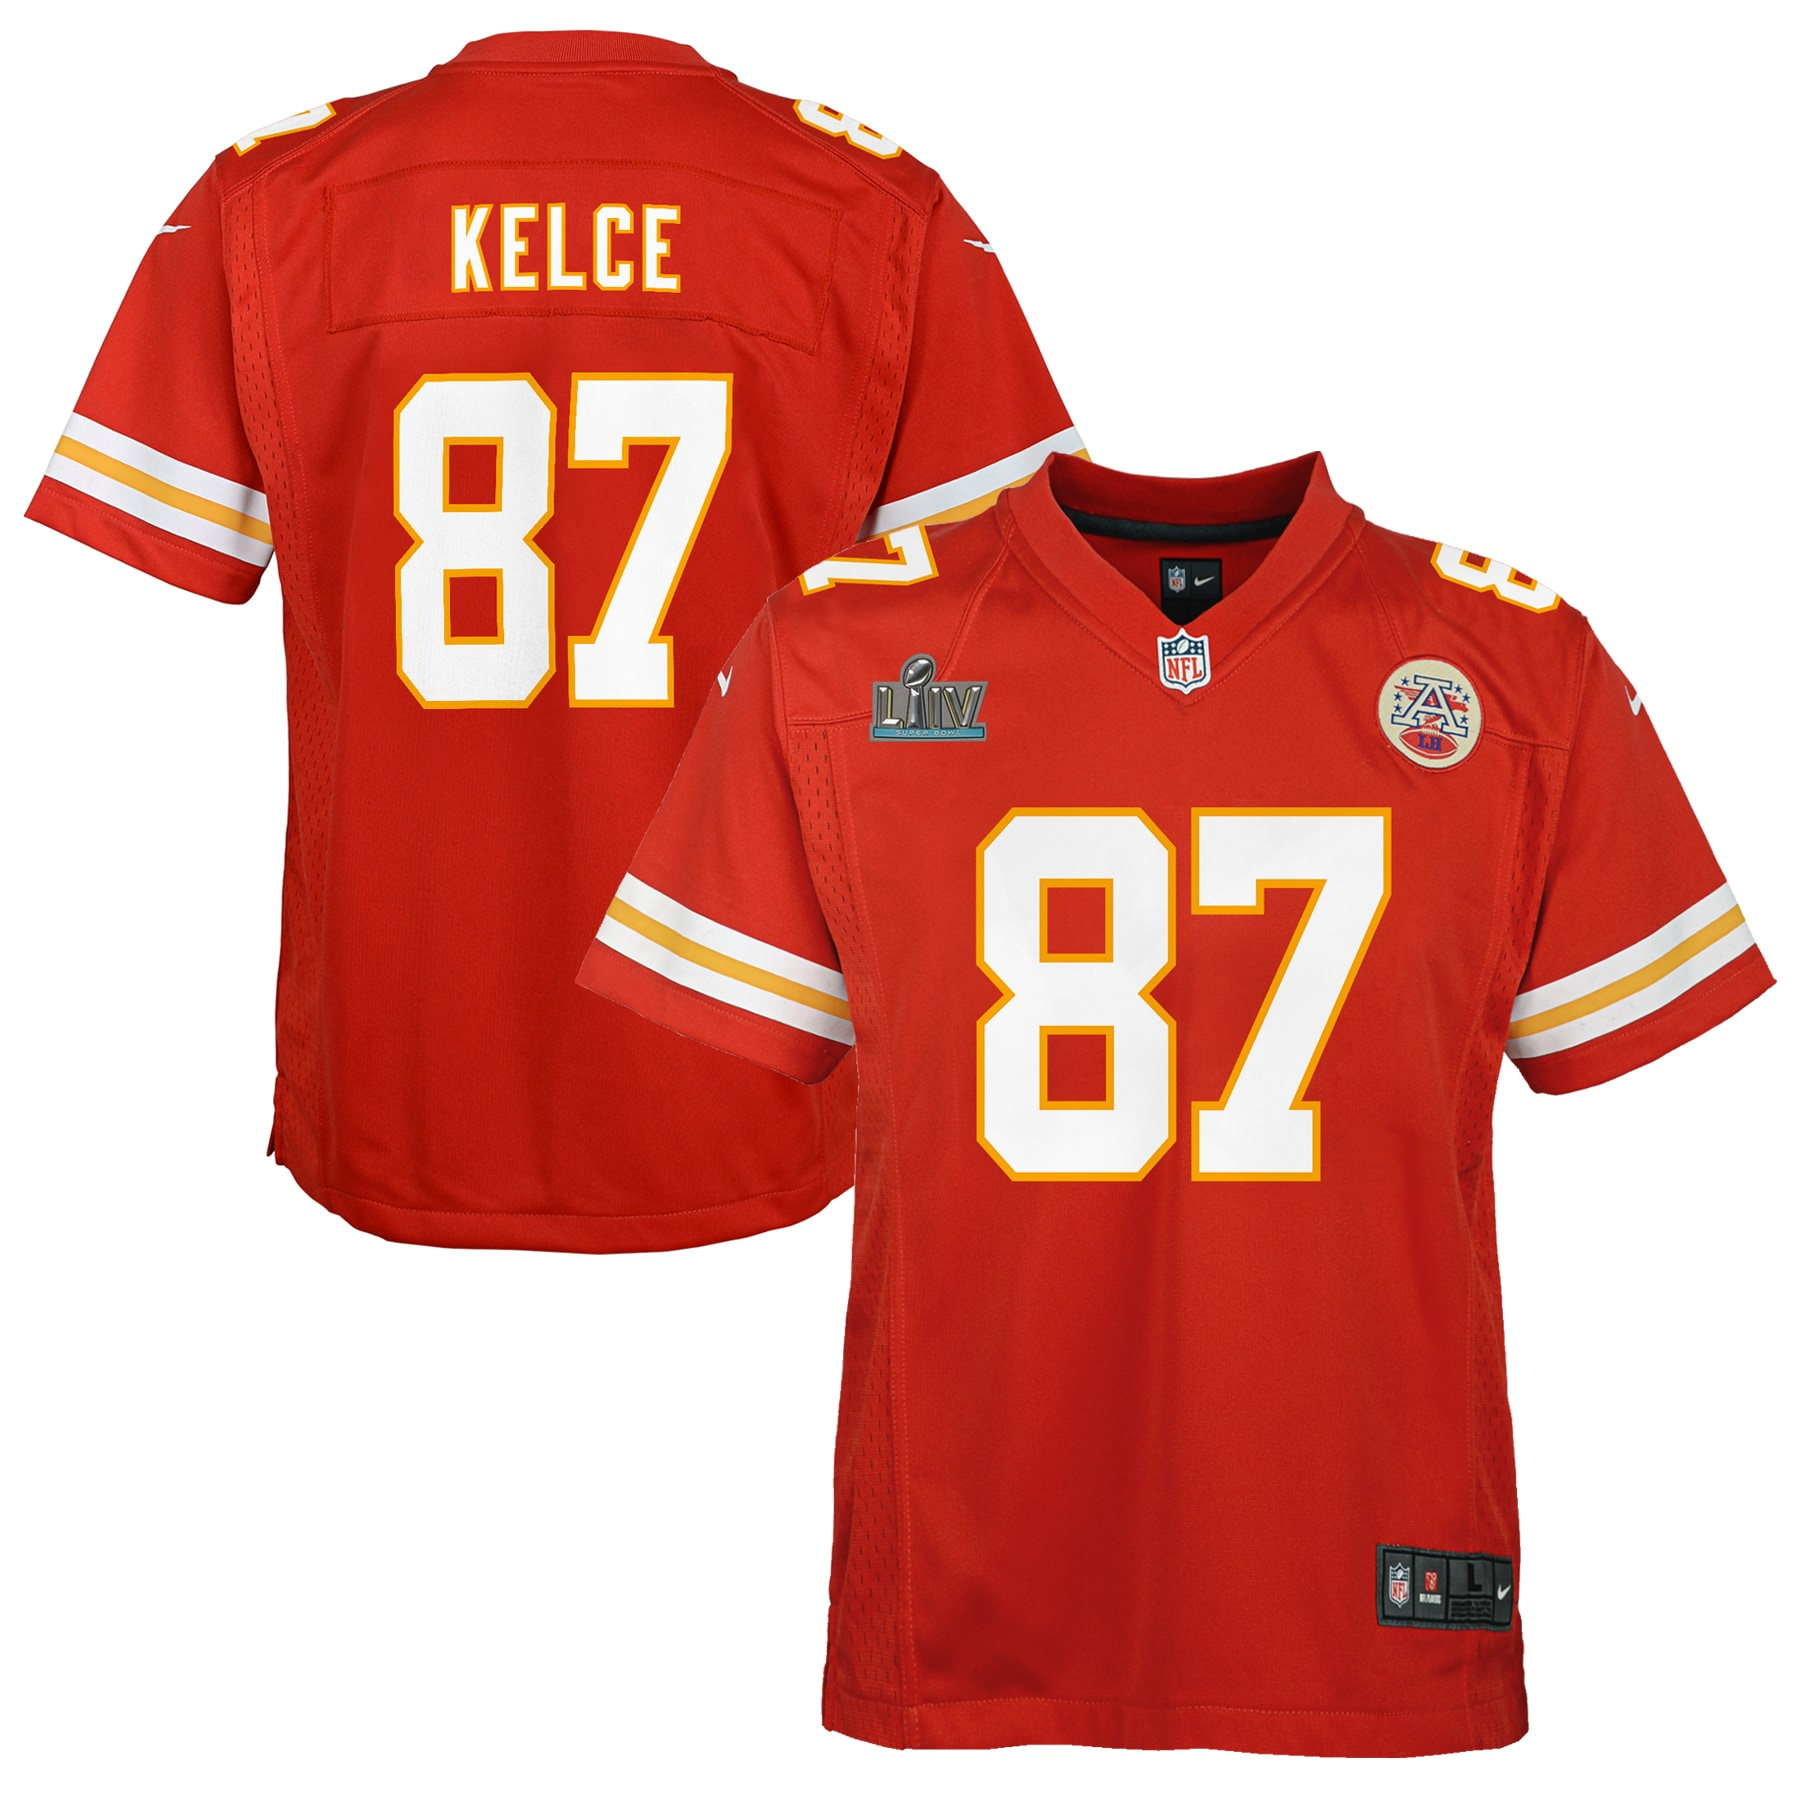 Travis Kelce Kansas City Chiefs Nike Youth Super Bowl LIV Game Jersey - Red - Walmart.com